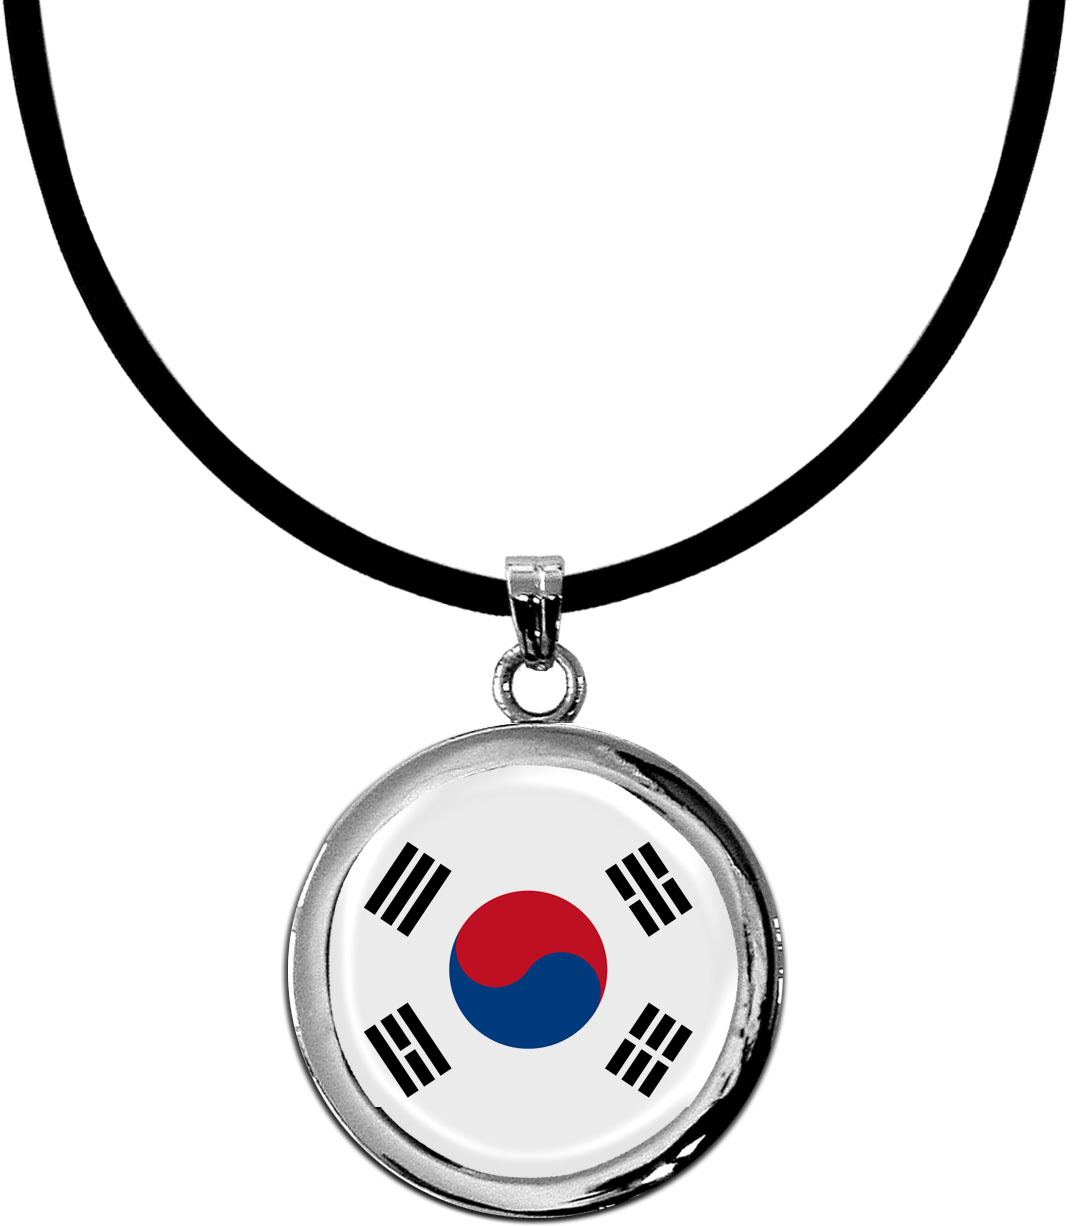 Kettenanhänger / Südkorea / Silikonband mit Silberverschluss